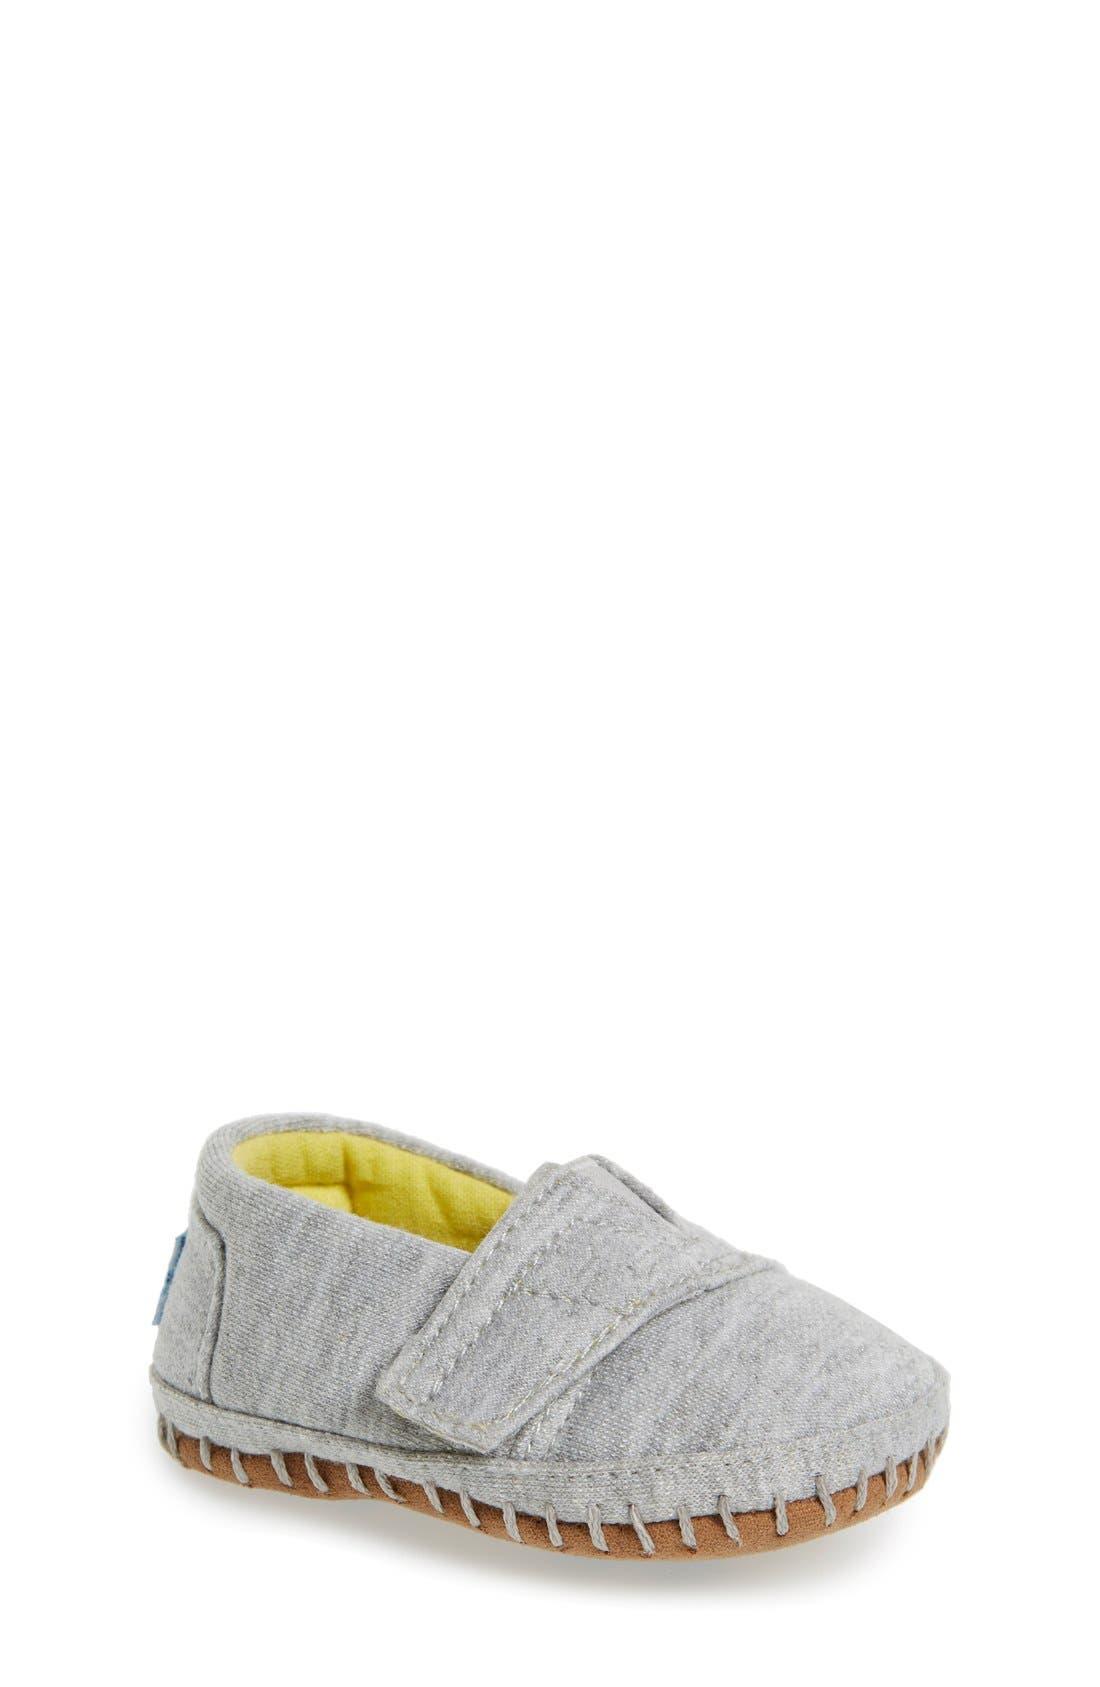 TOMS Alpargata Chambray Crib Shoe